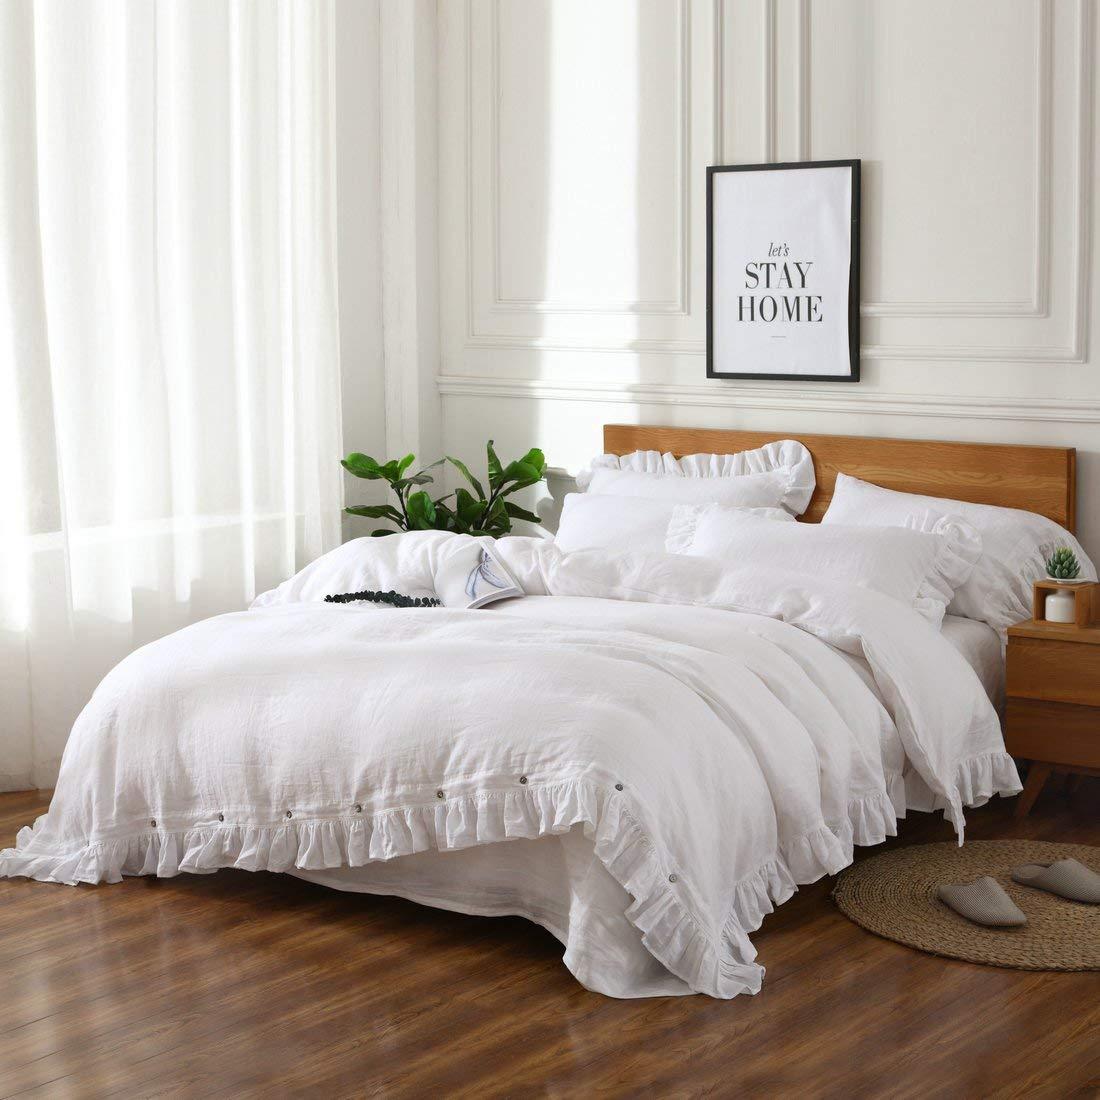 esasilk Vintage Ruffles Linen Duvet Cover Sets 100% Pure Linen King Queen Twin 3piece per Set